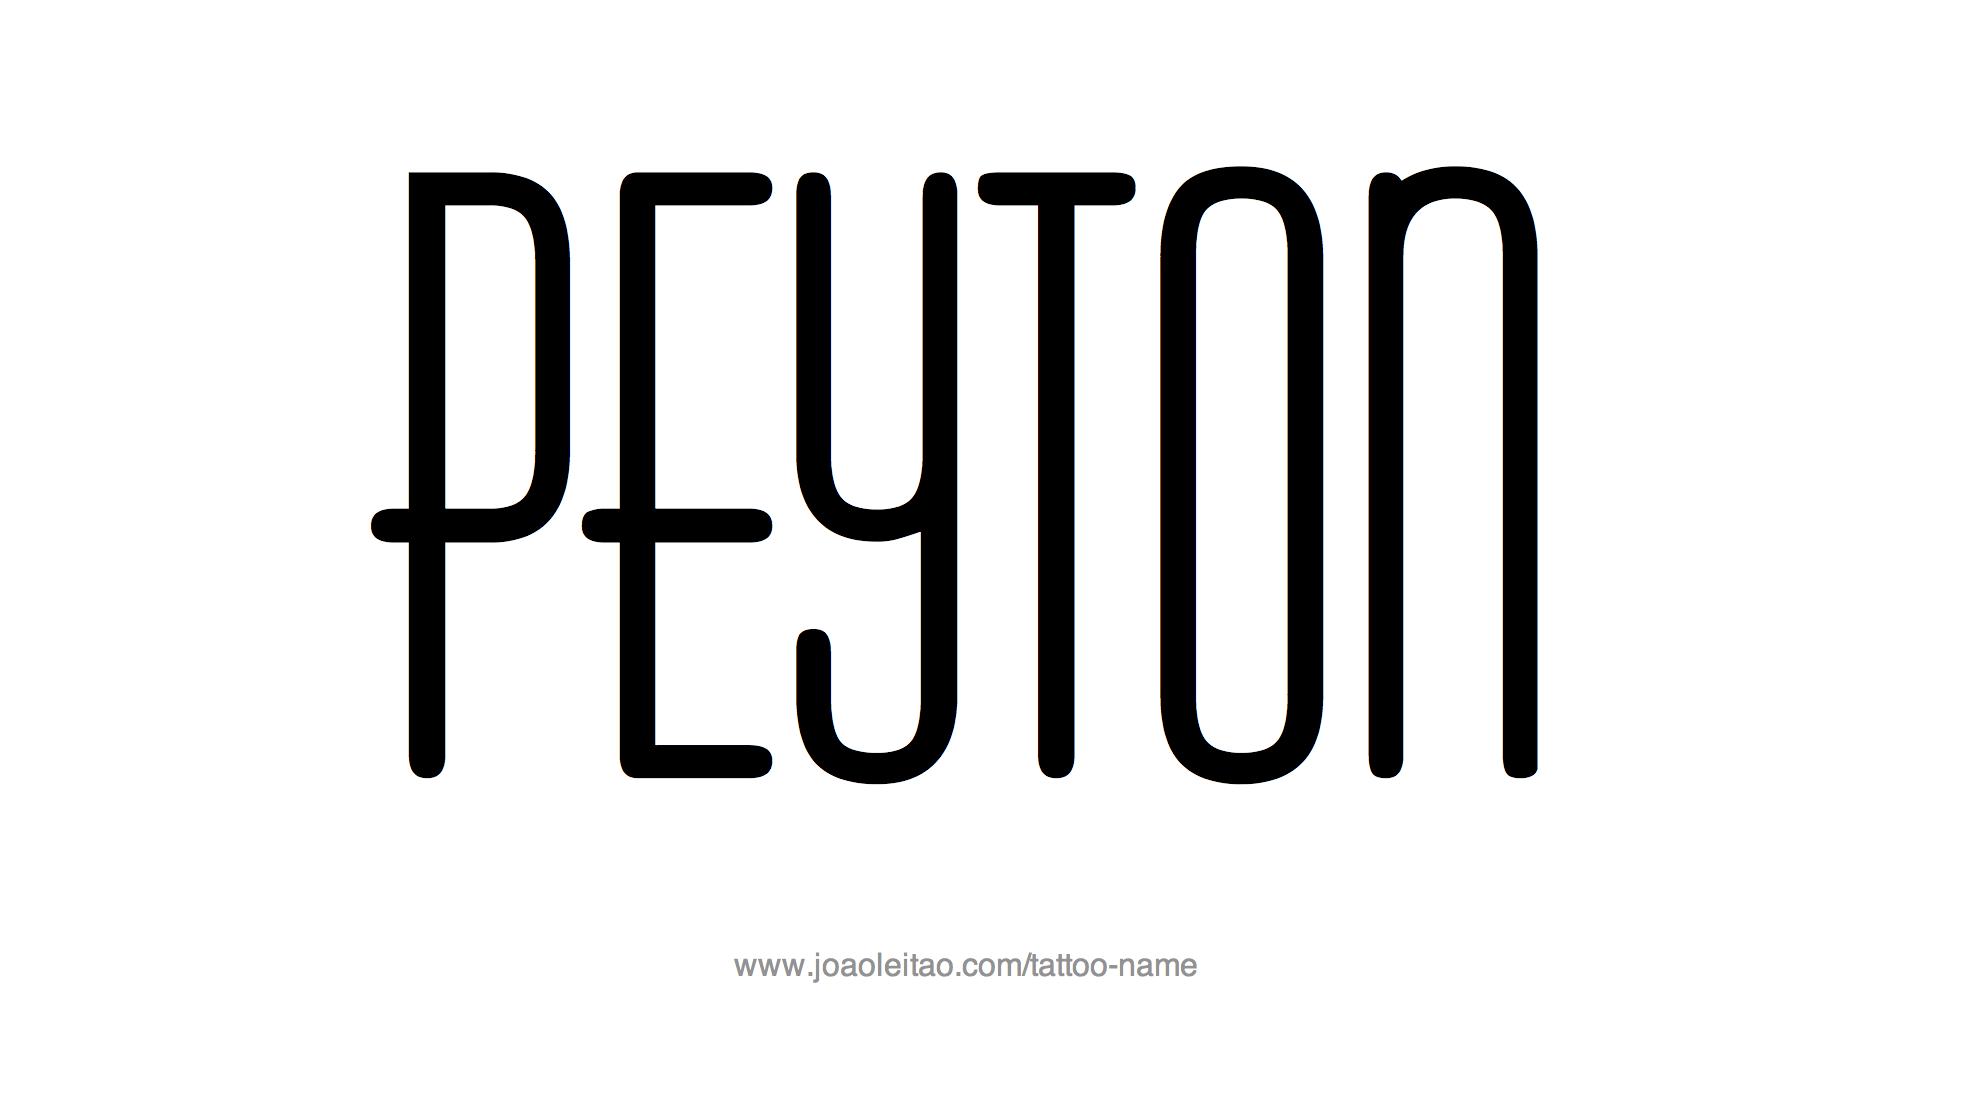 Tattoo Design Name Peyton